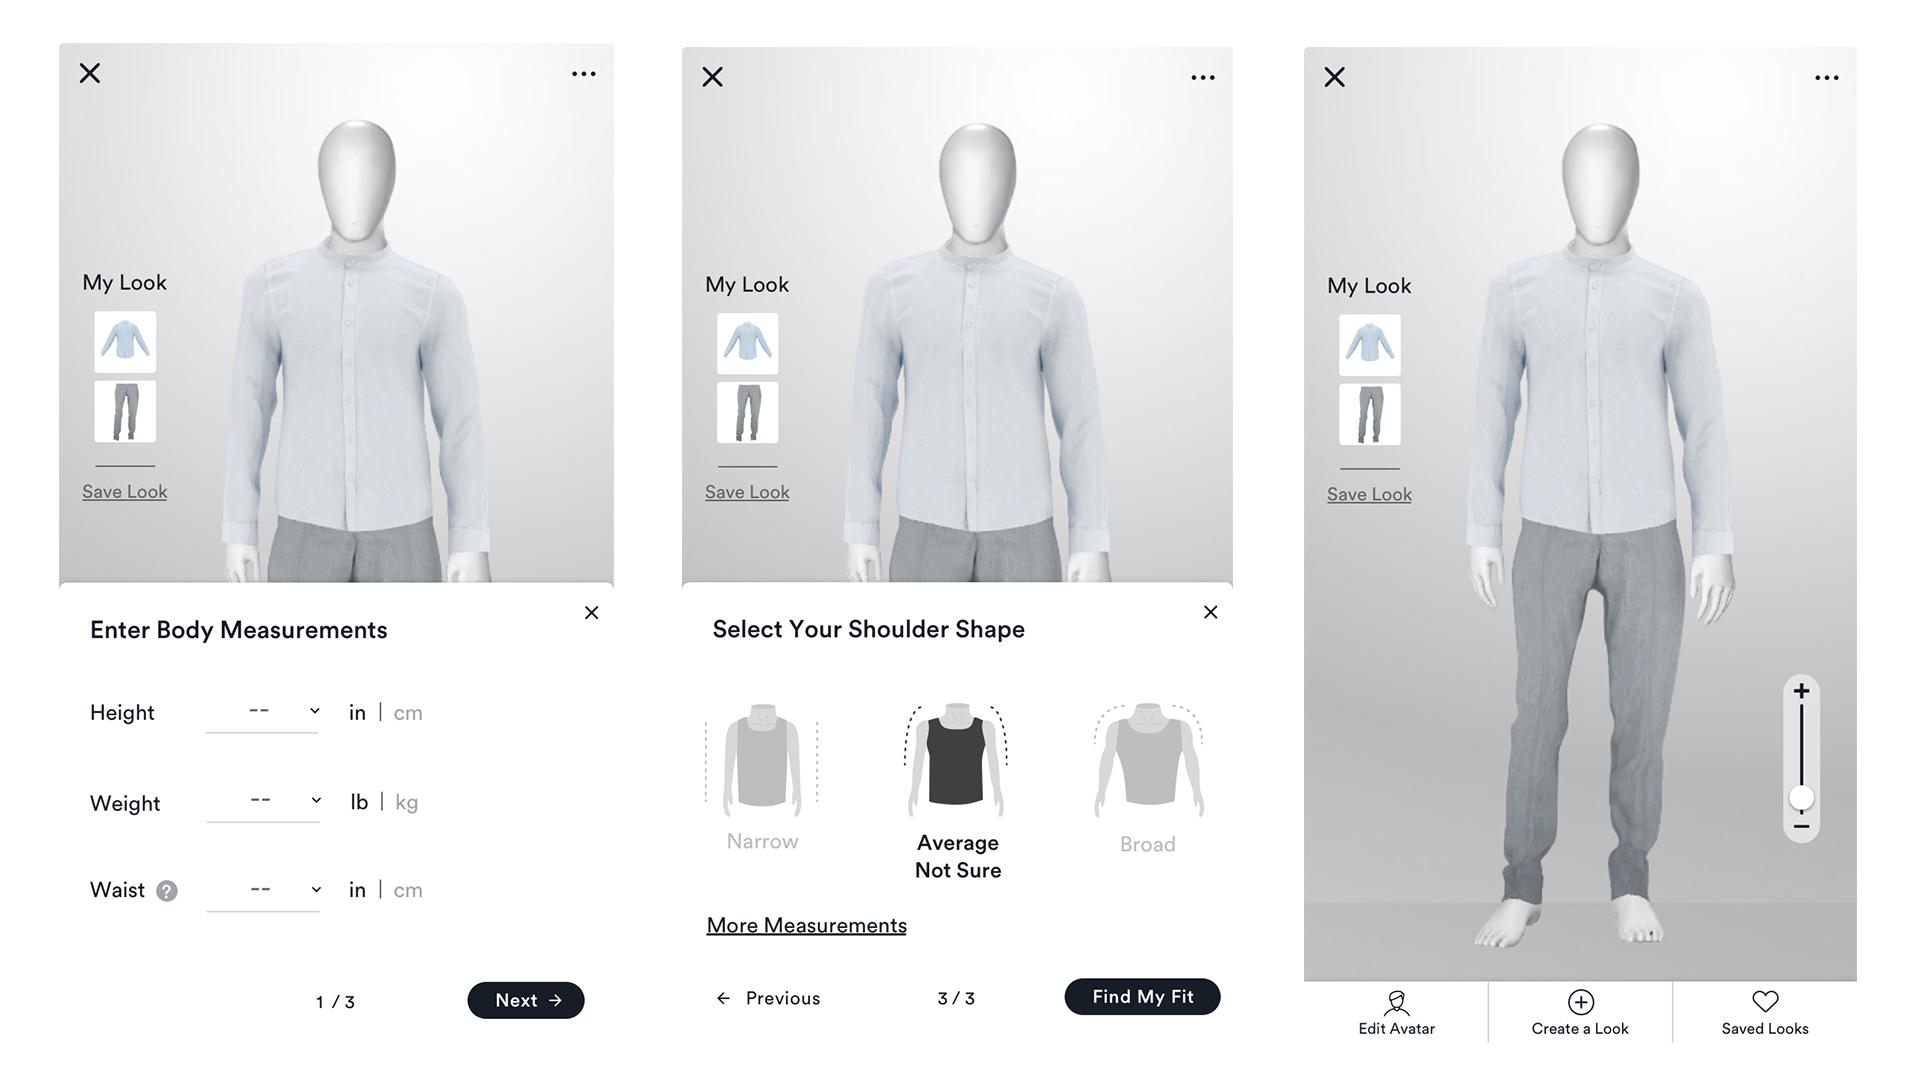 Men's virtual fitting room personalized measurement screens